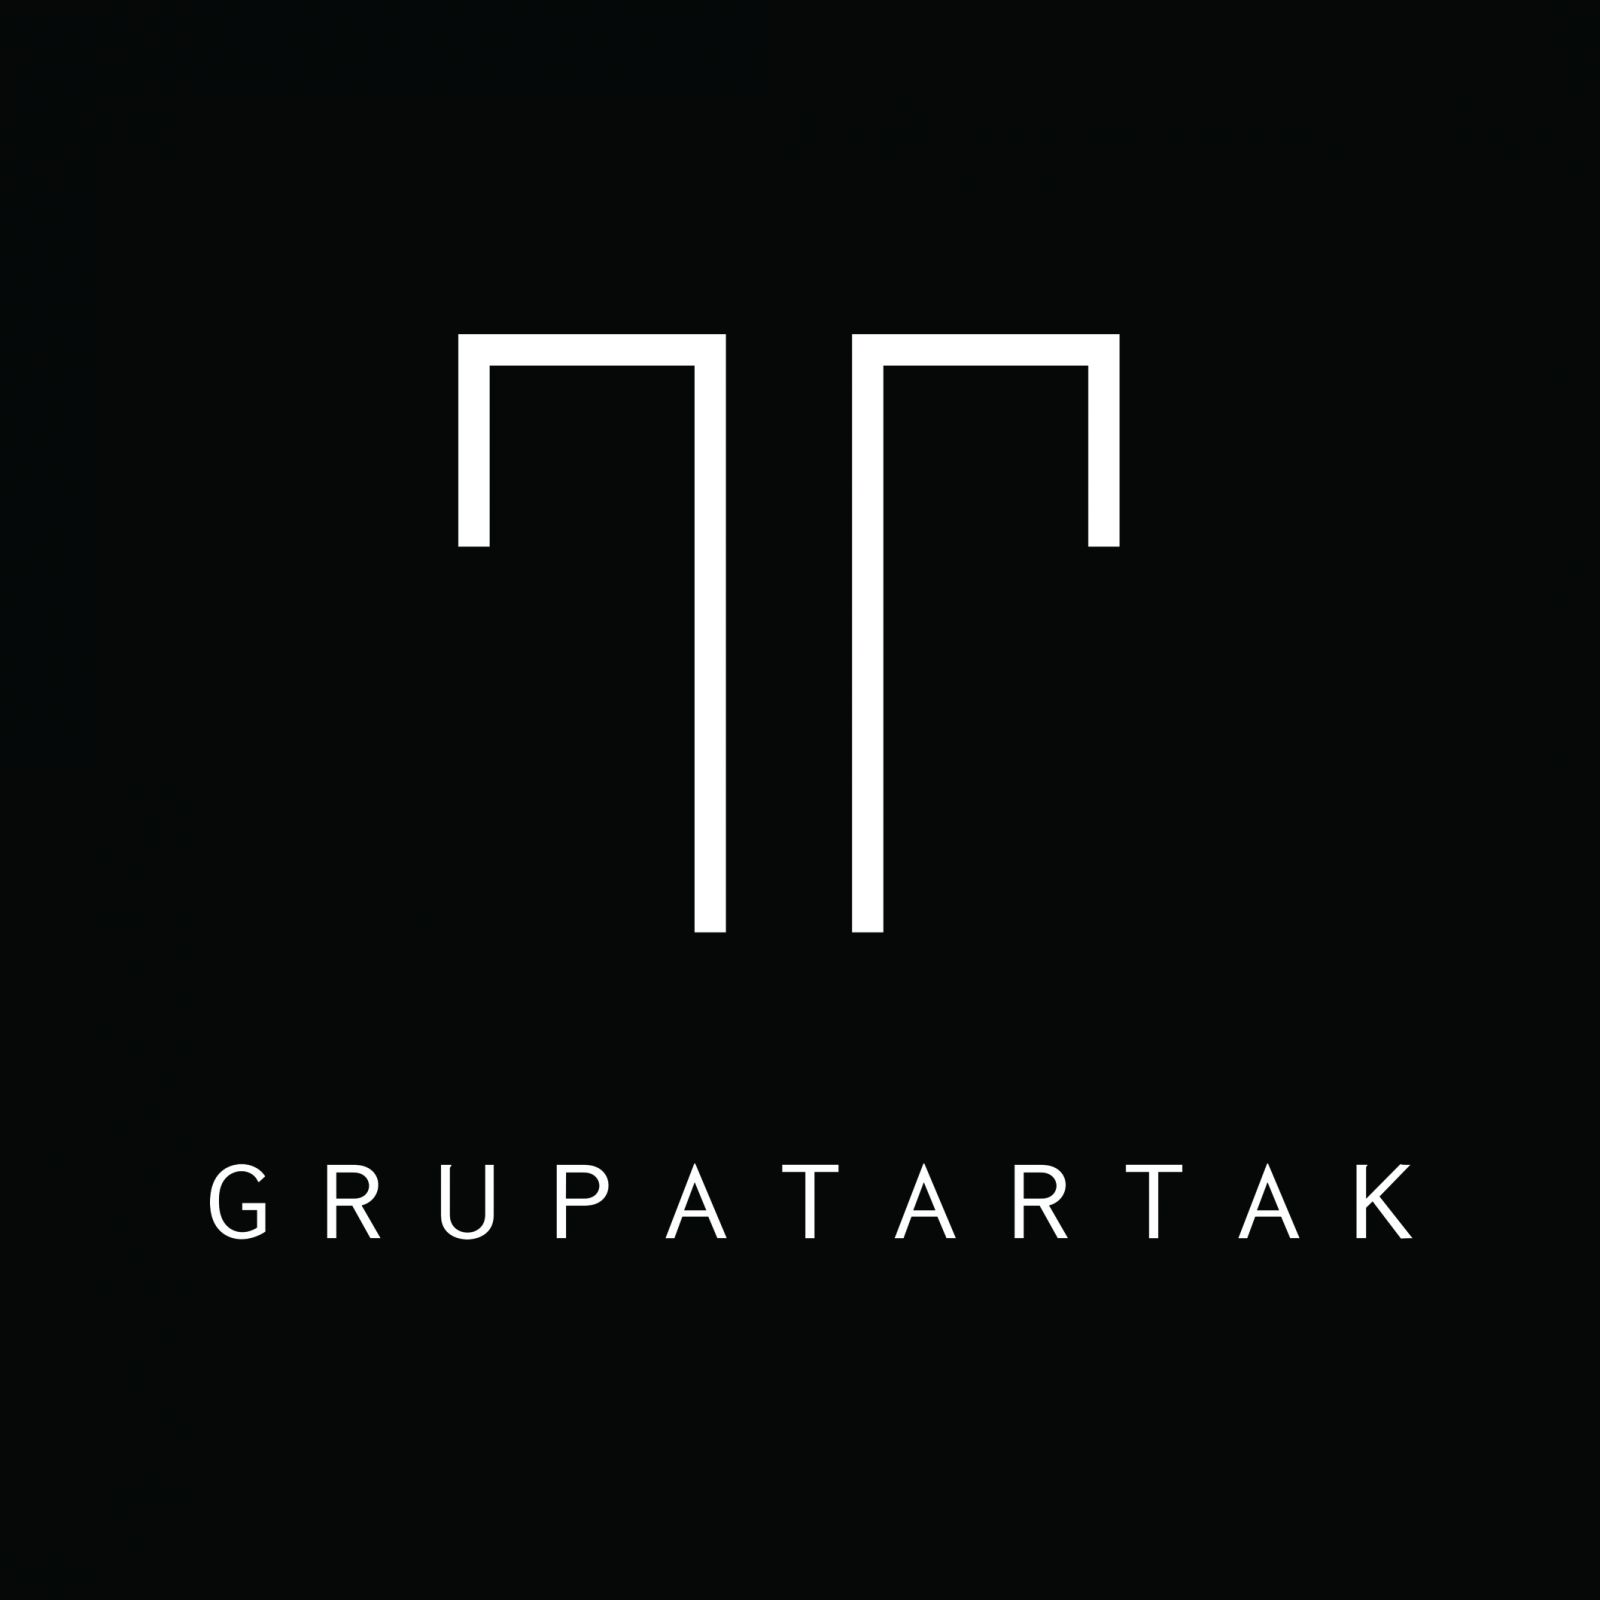 GRUPA TARTAK